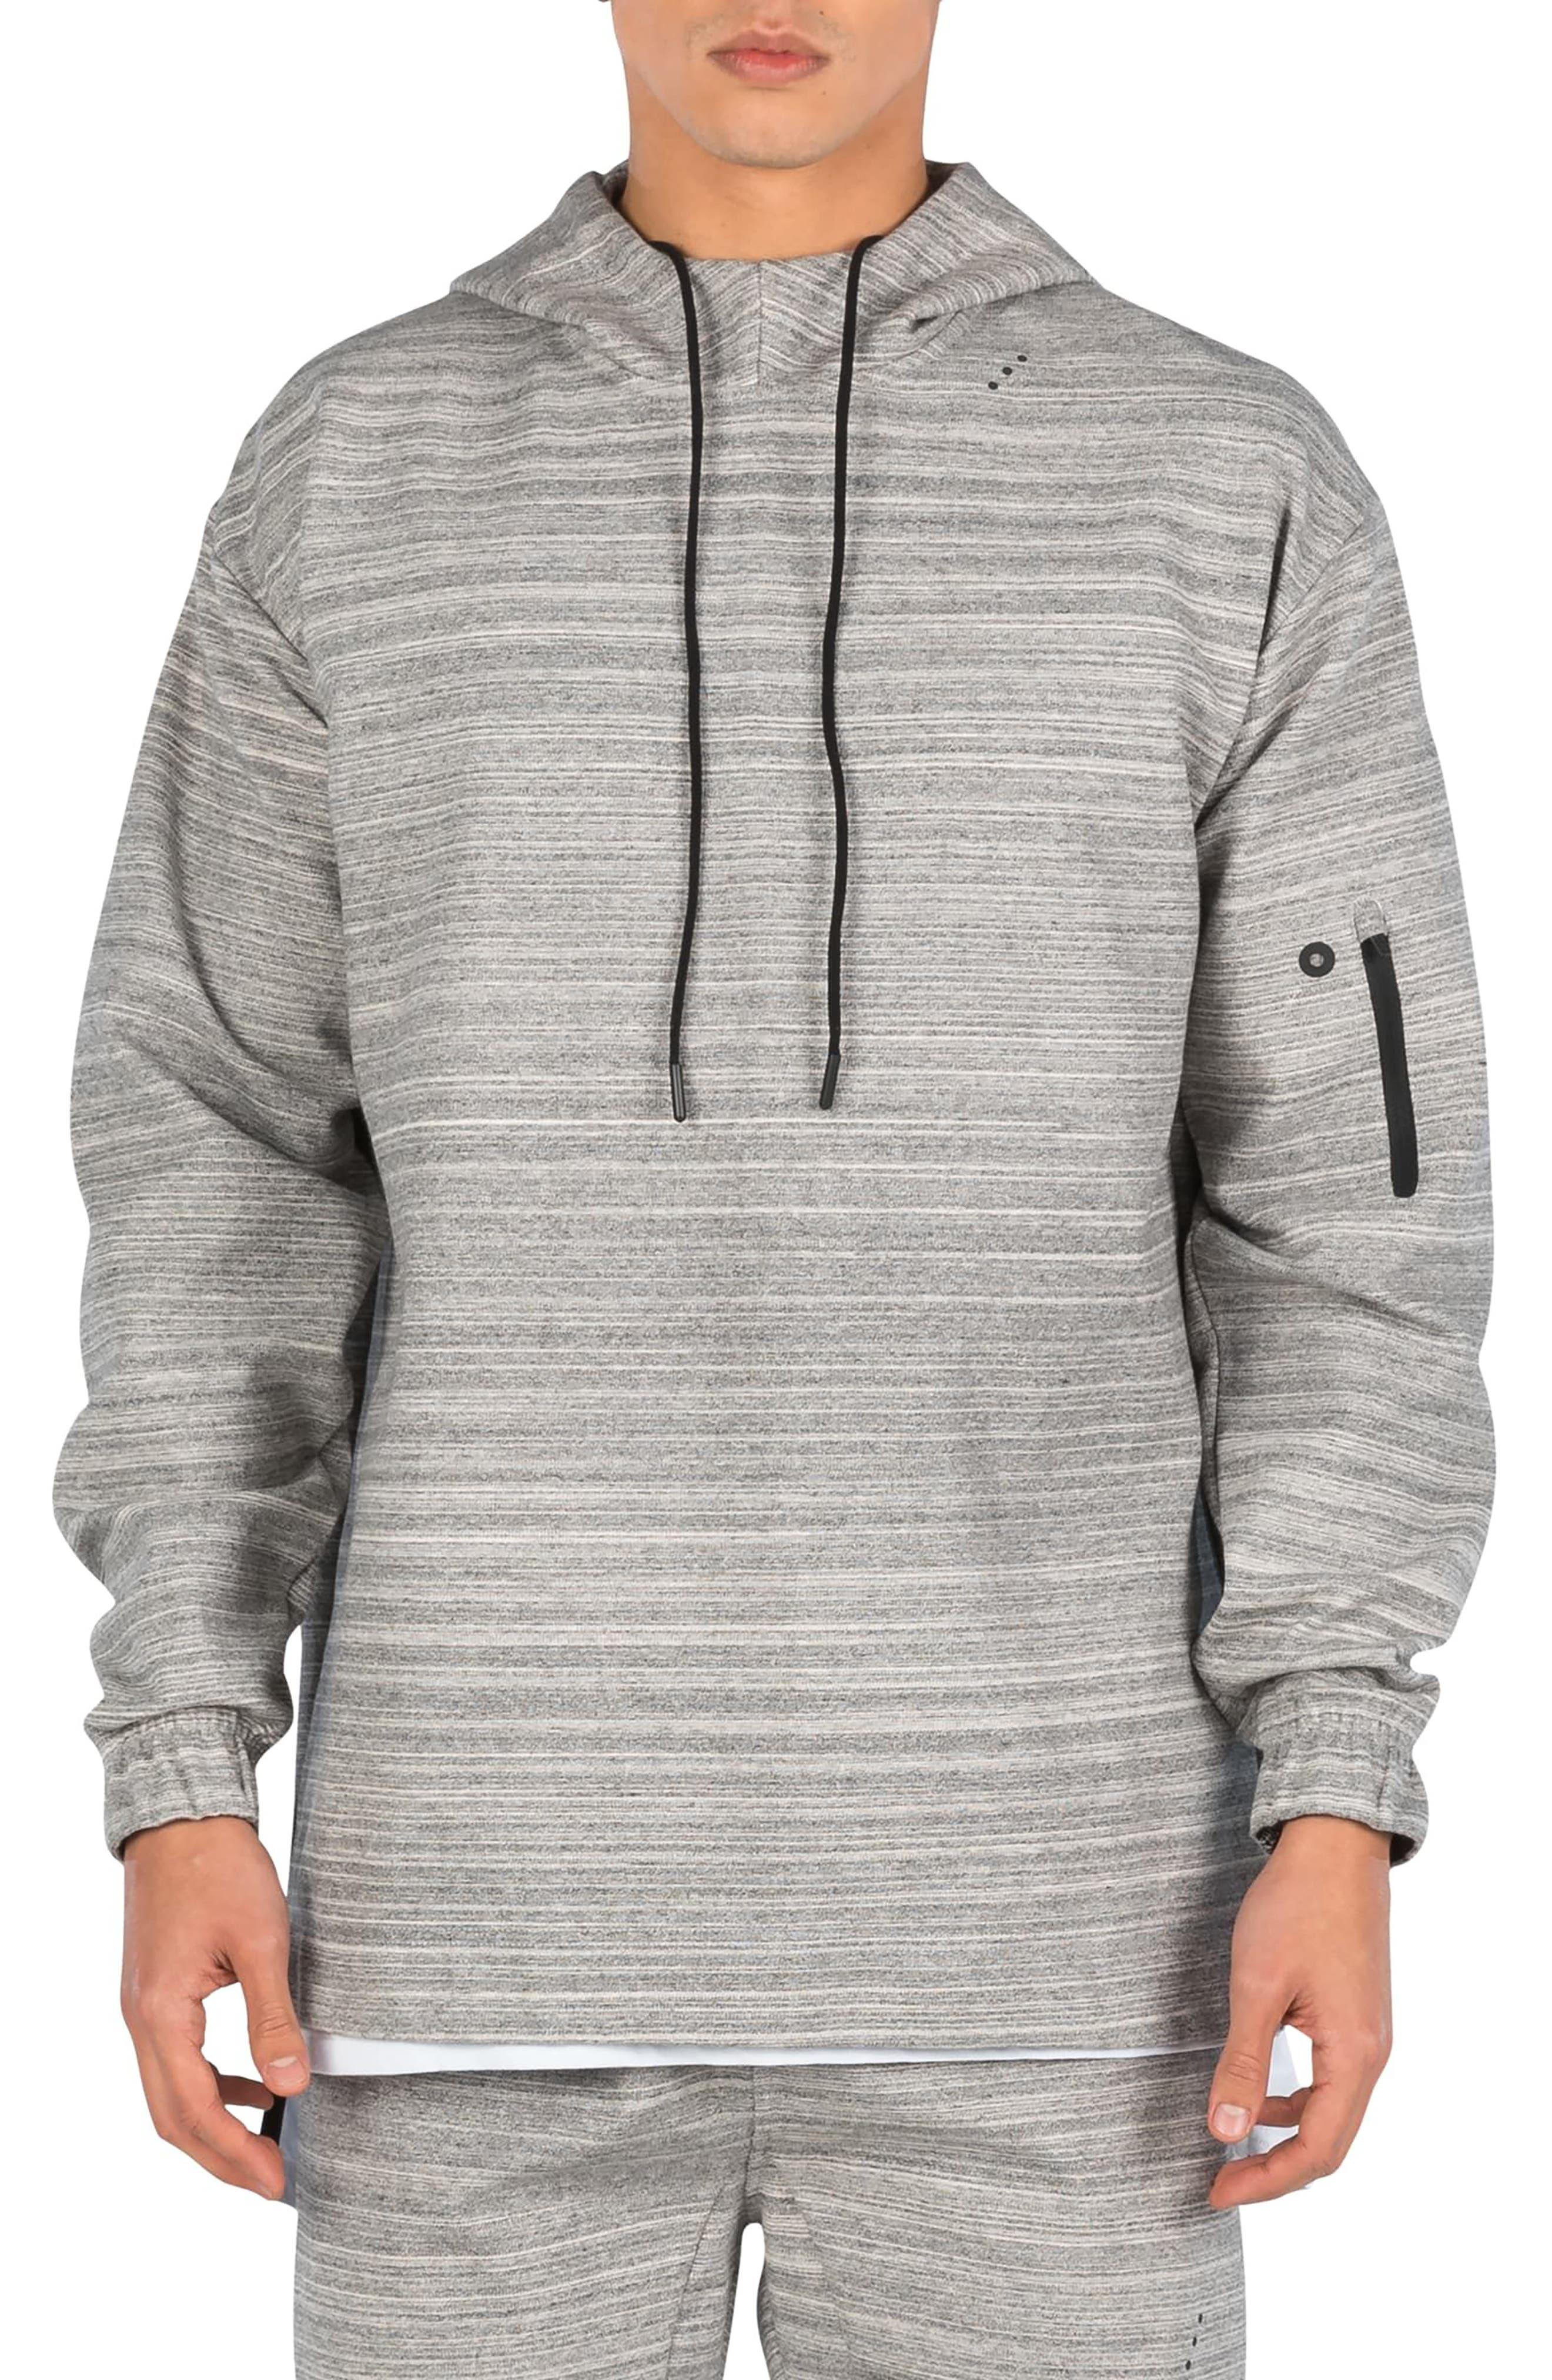 Tech Hoodie Sweatshirt,                         Main,                         color, 031